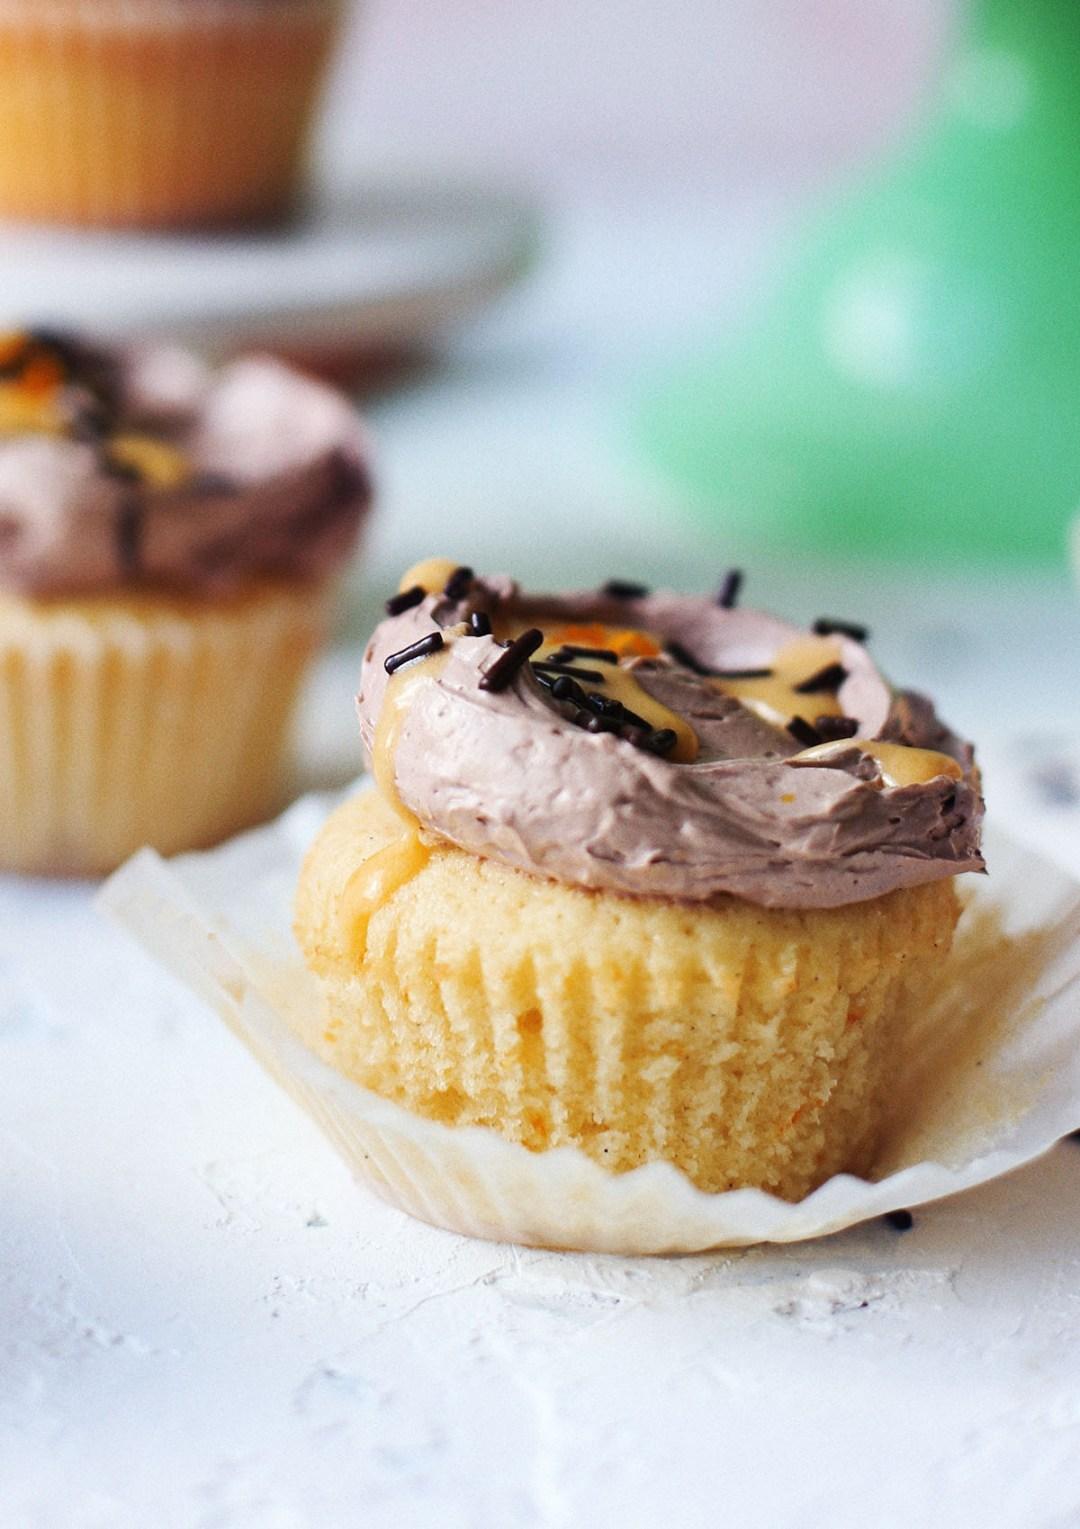 Orange Spice Cupcakes with Chocolate Italian Meringue Buttercream and Orange Curd